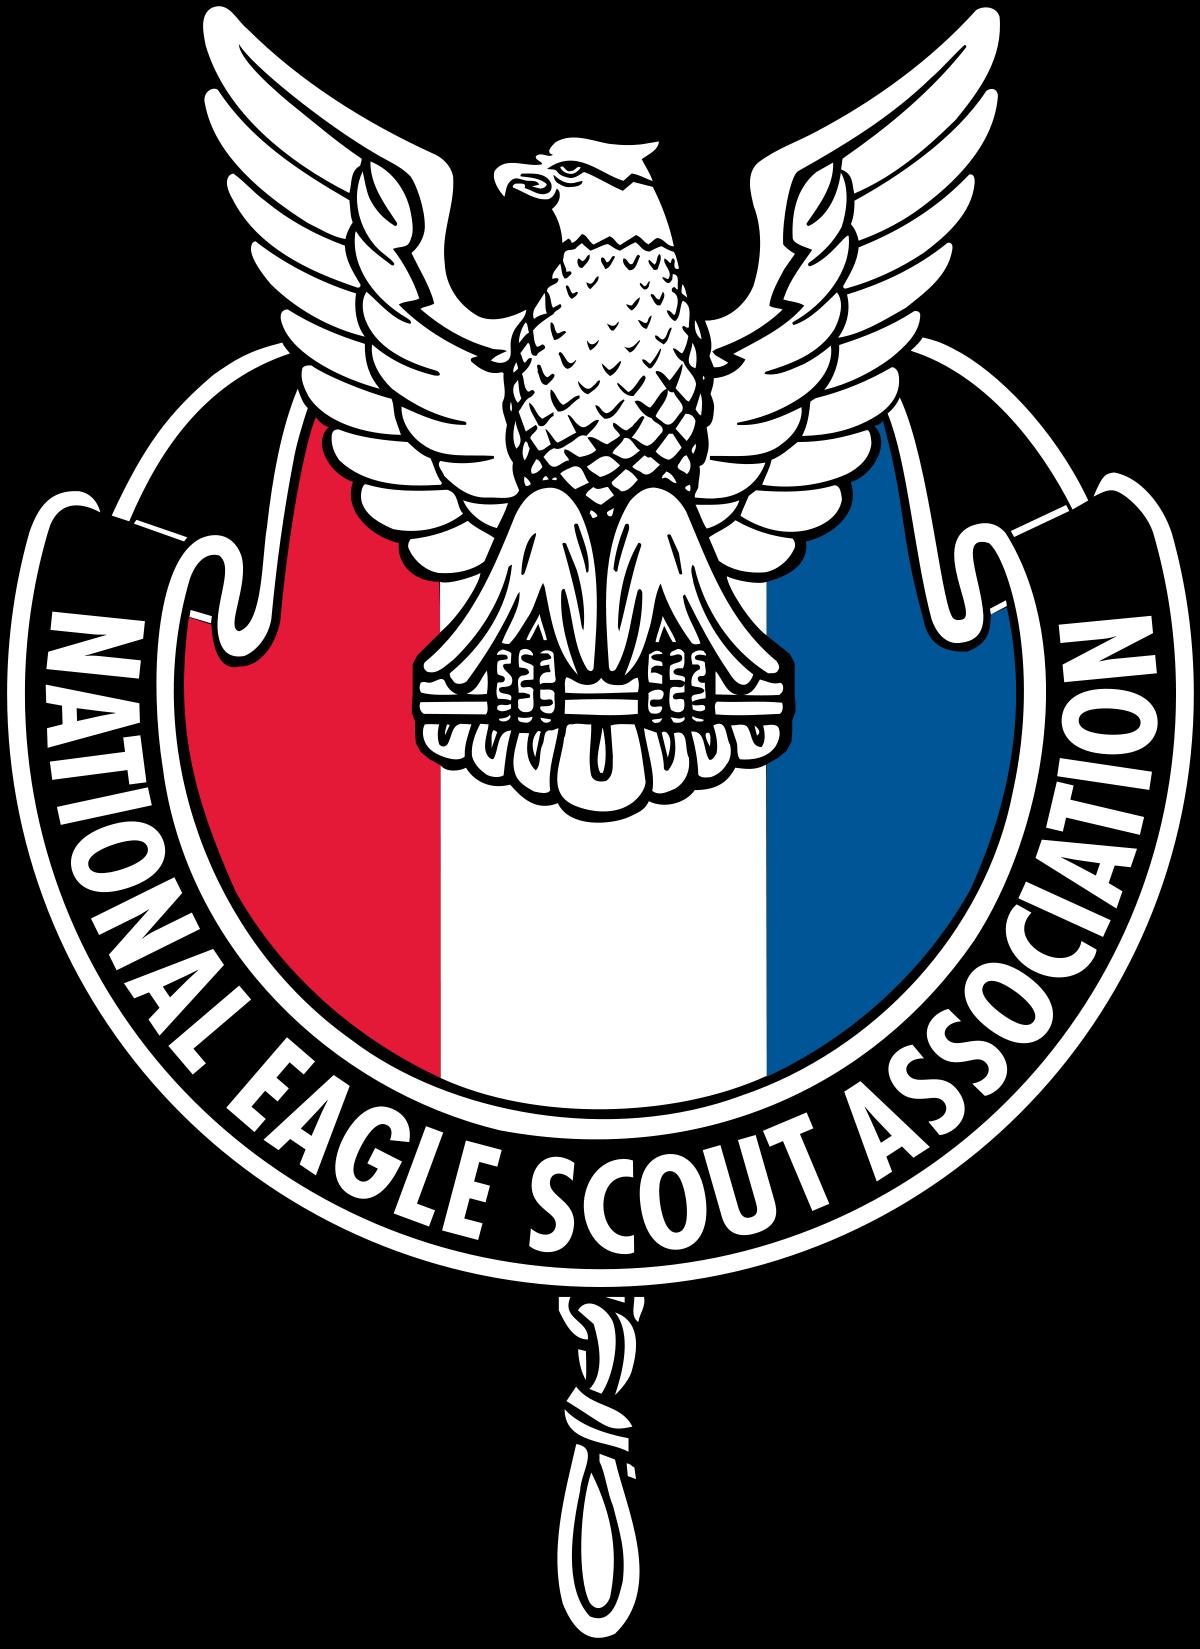 Explorer clipart louisiana early. National eagle scout association